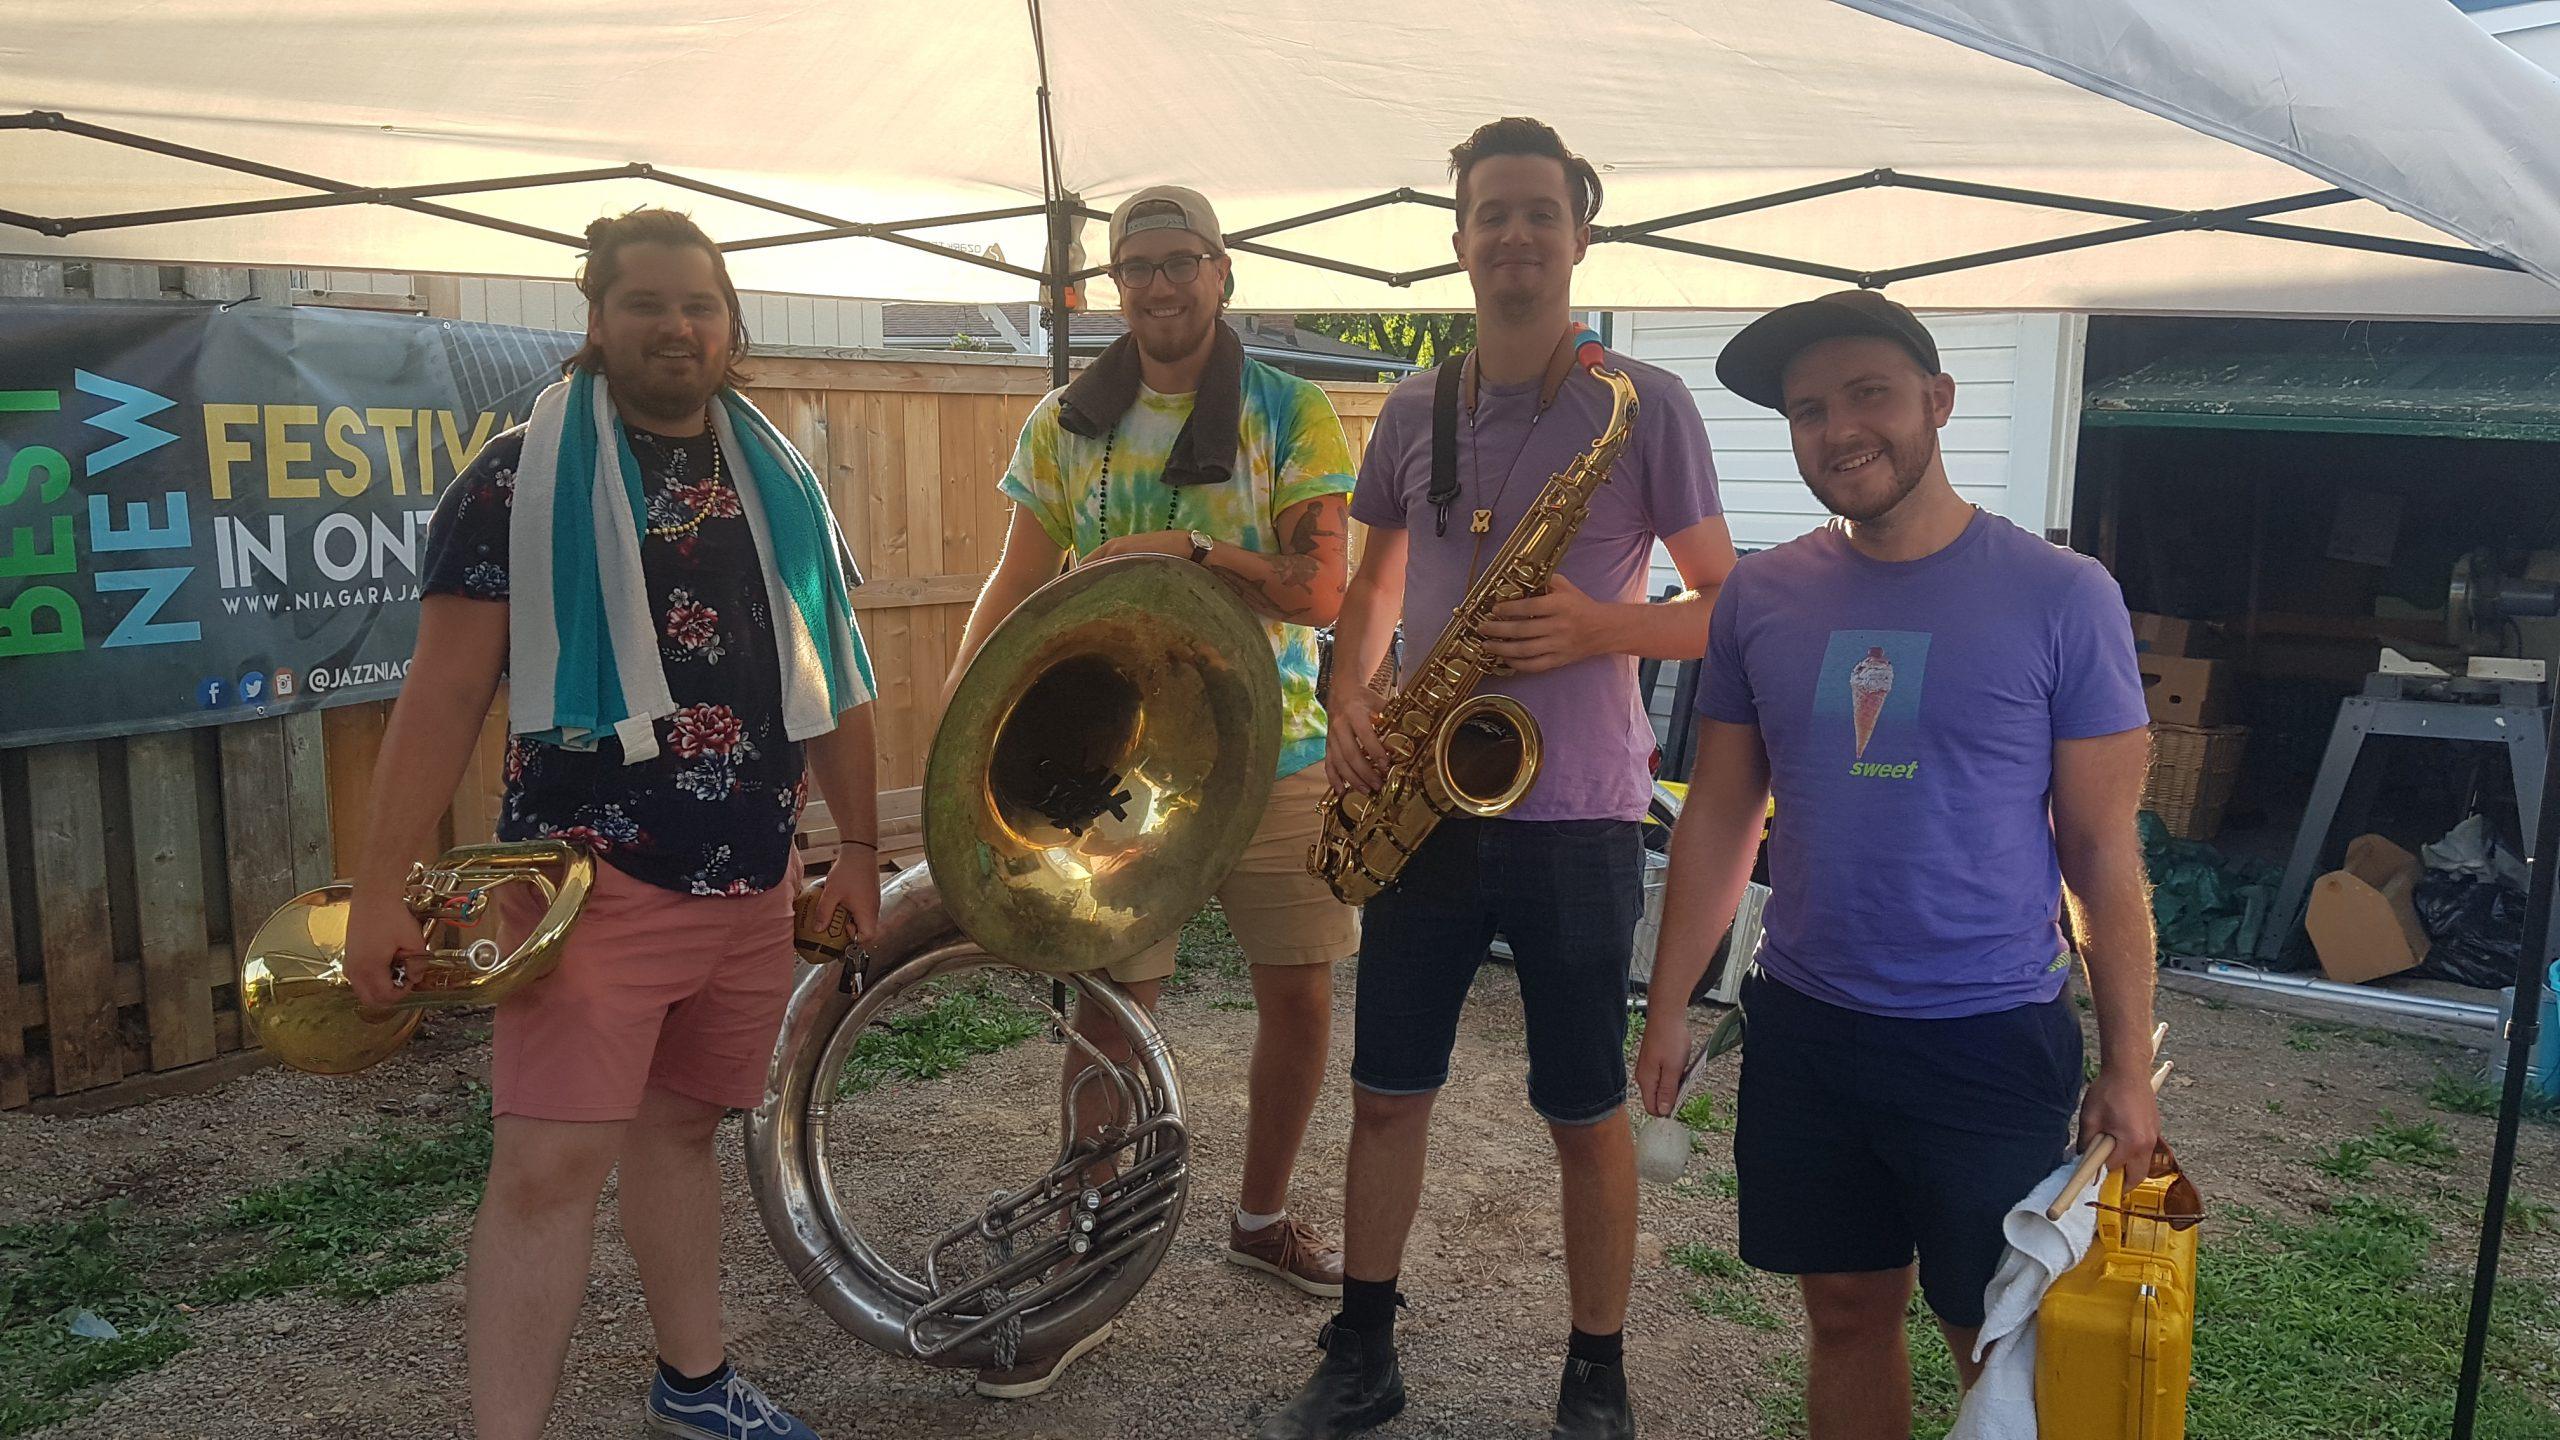 Big Smoke Brass - Niagara's ONLINE Summer Mardi Gras - Saturday, July 18, 2020. Photo: Nicholas Paolone